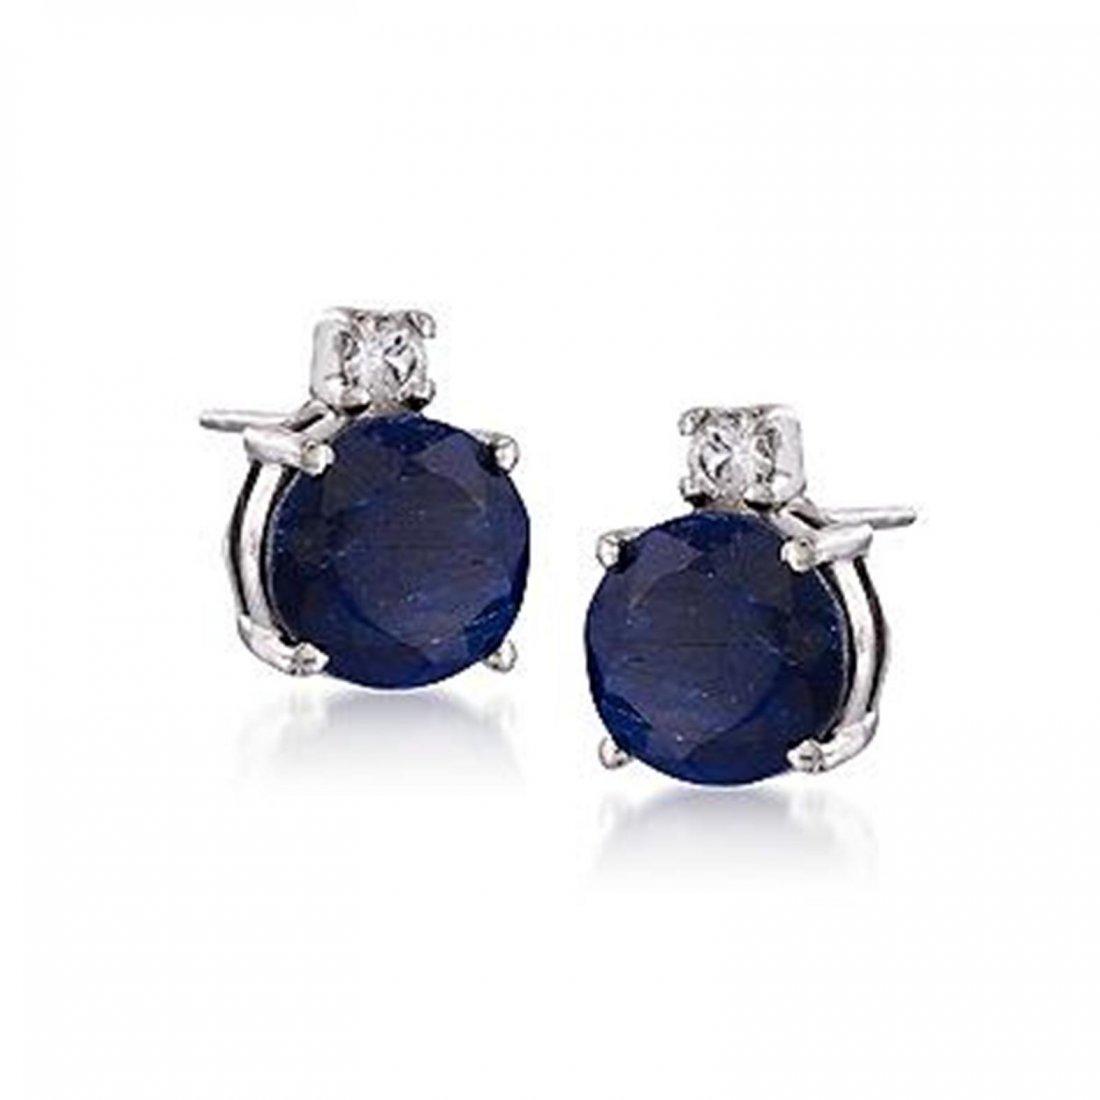 4.80 ct. t.w. Sapphire and .15 ct. t.w. Topaz Stud Earr